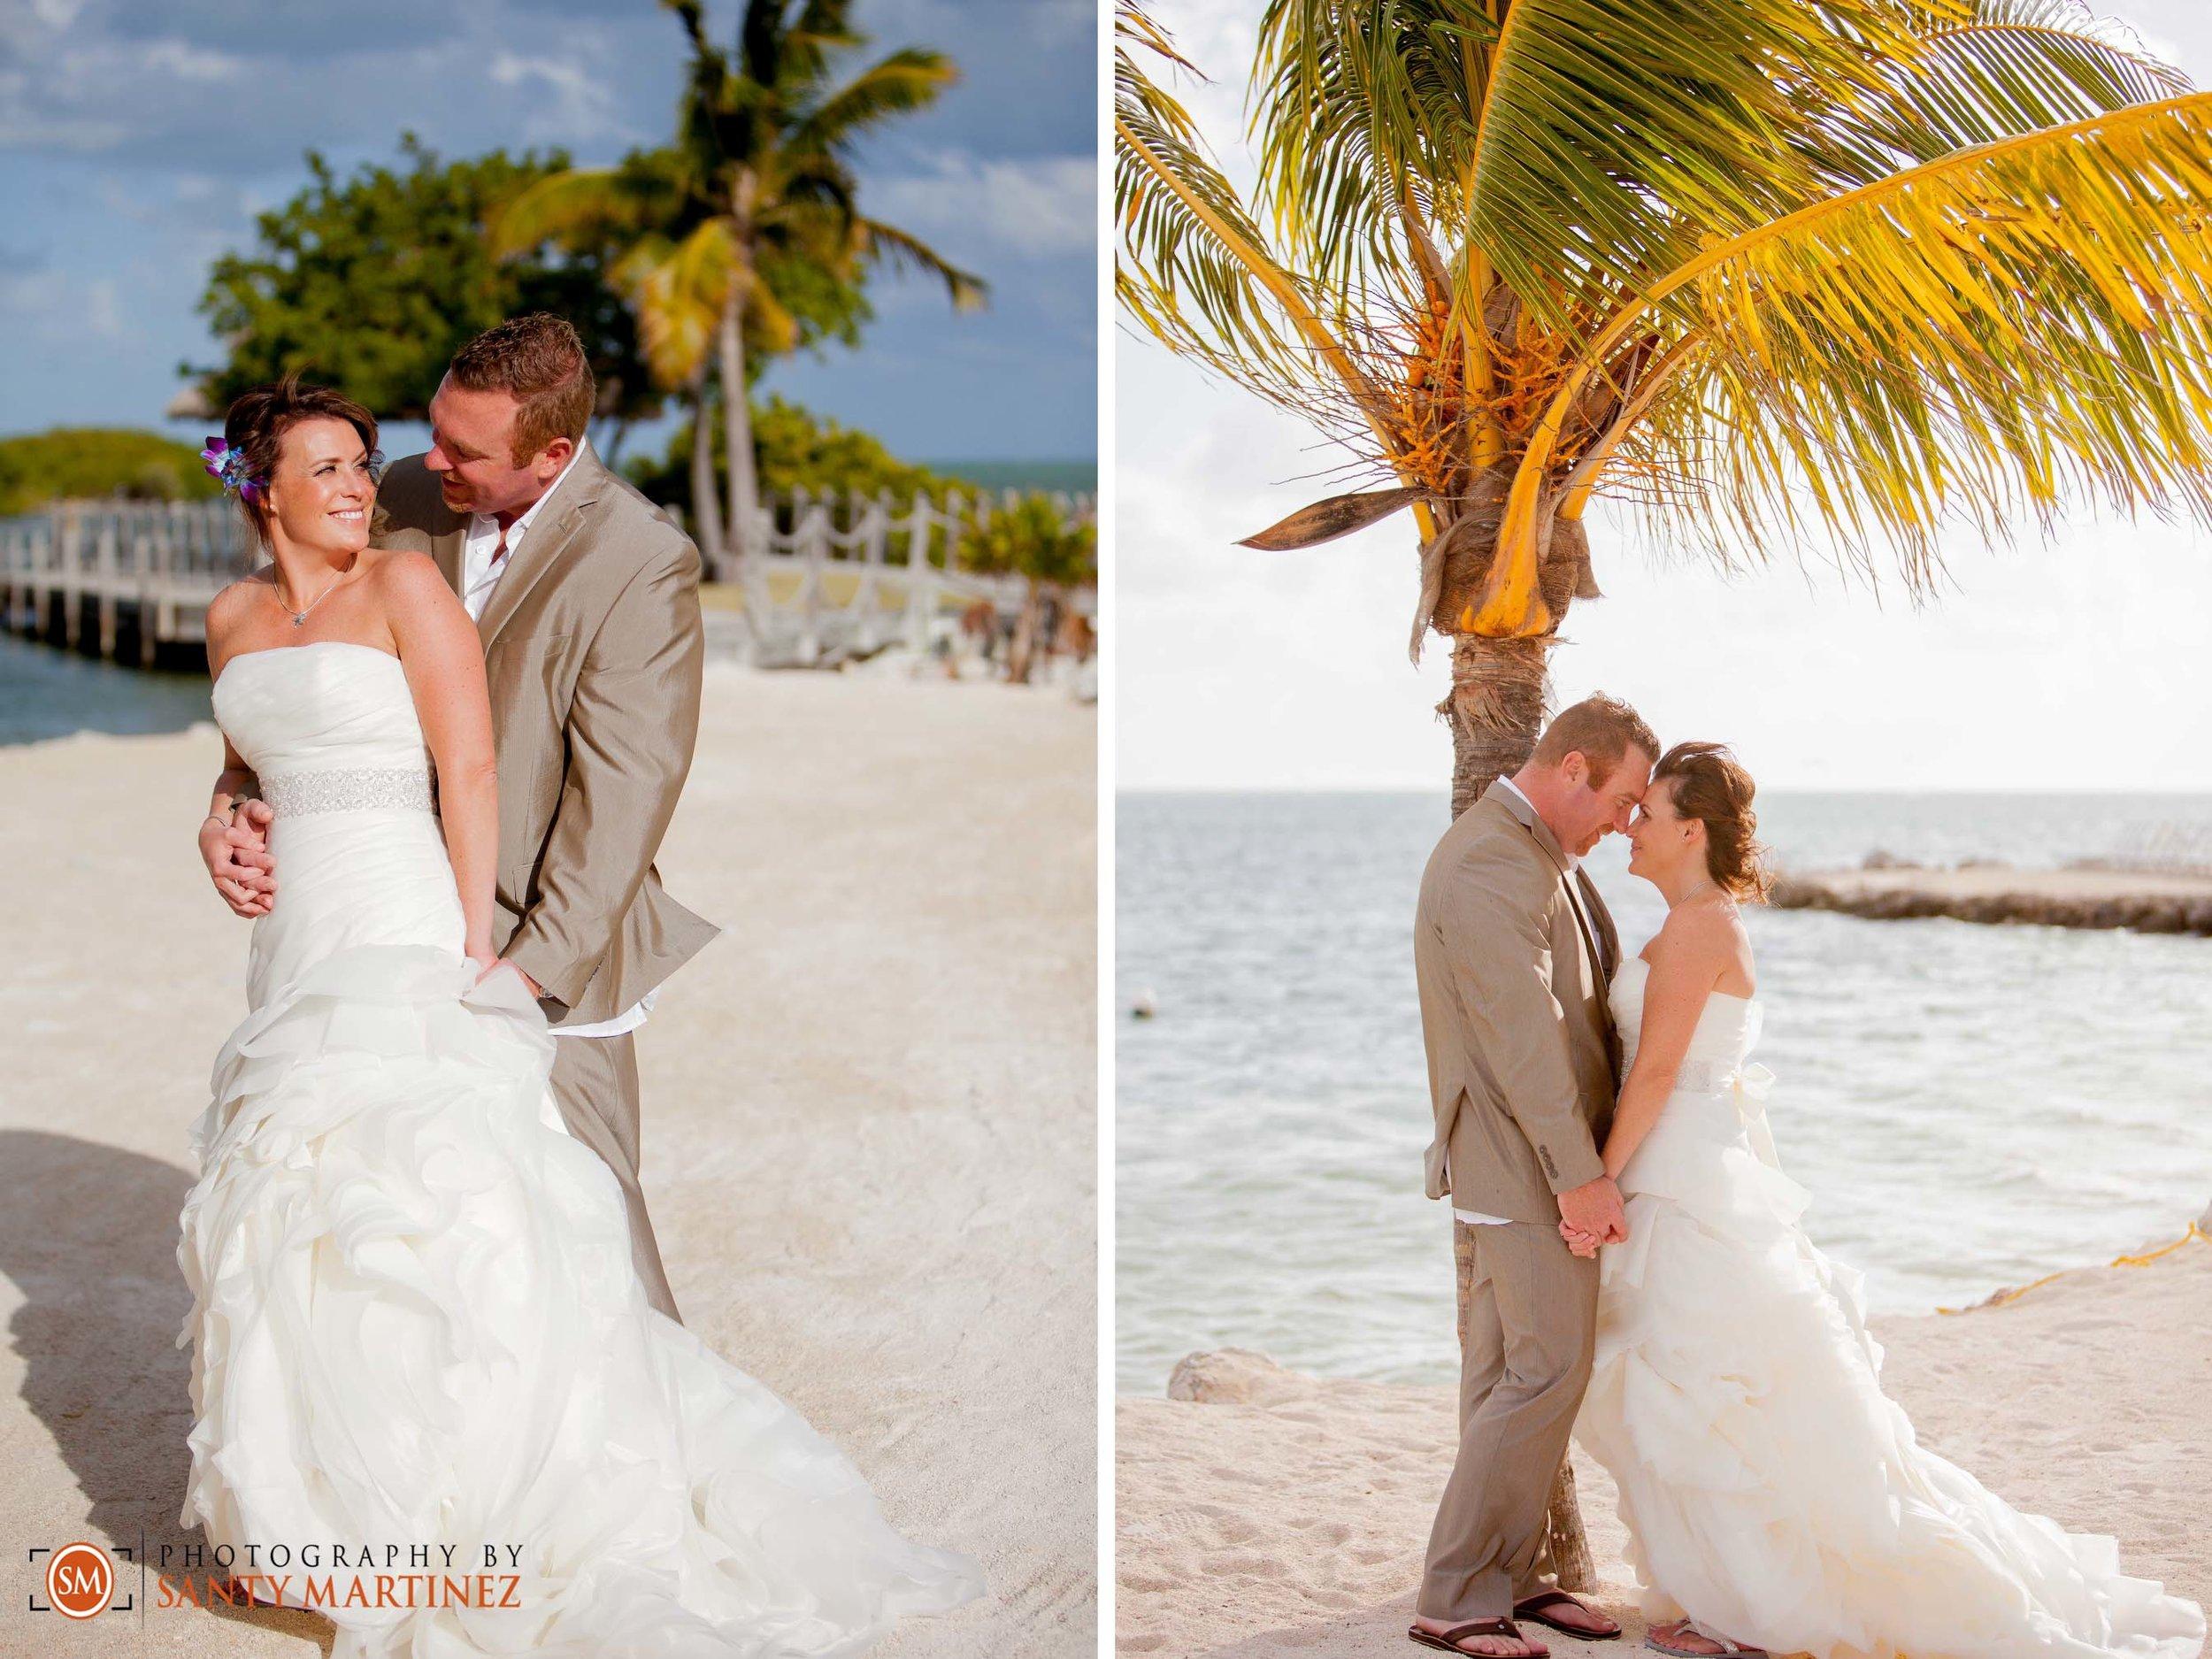 Photography by Santy Martinez - Miami Wedding Photographer-023.jpg